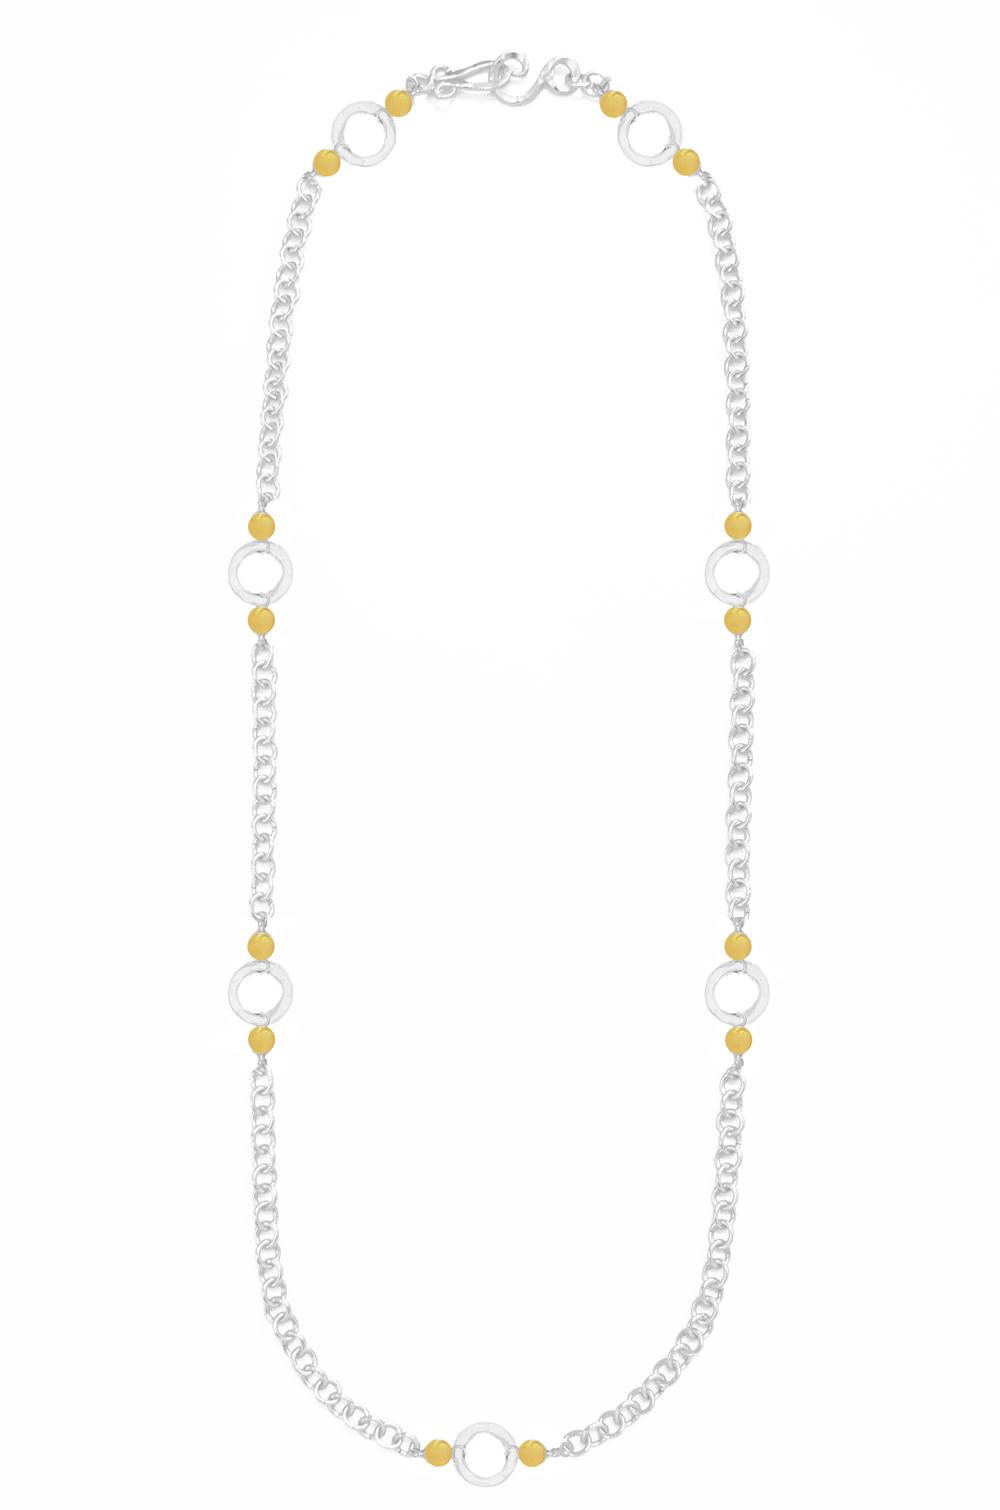 JHF-NEF15BRS-1b6F14   Infinity Necklace.jpg